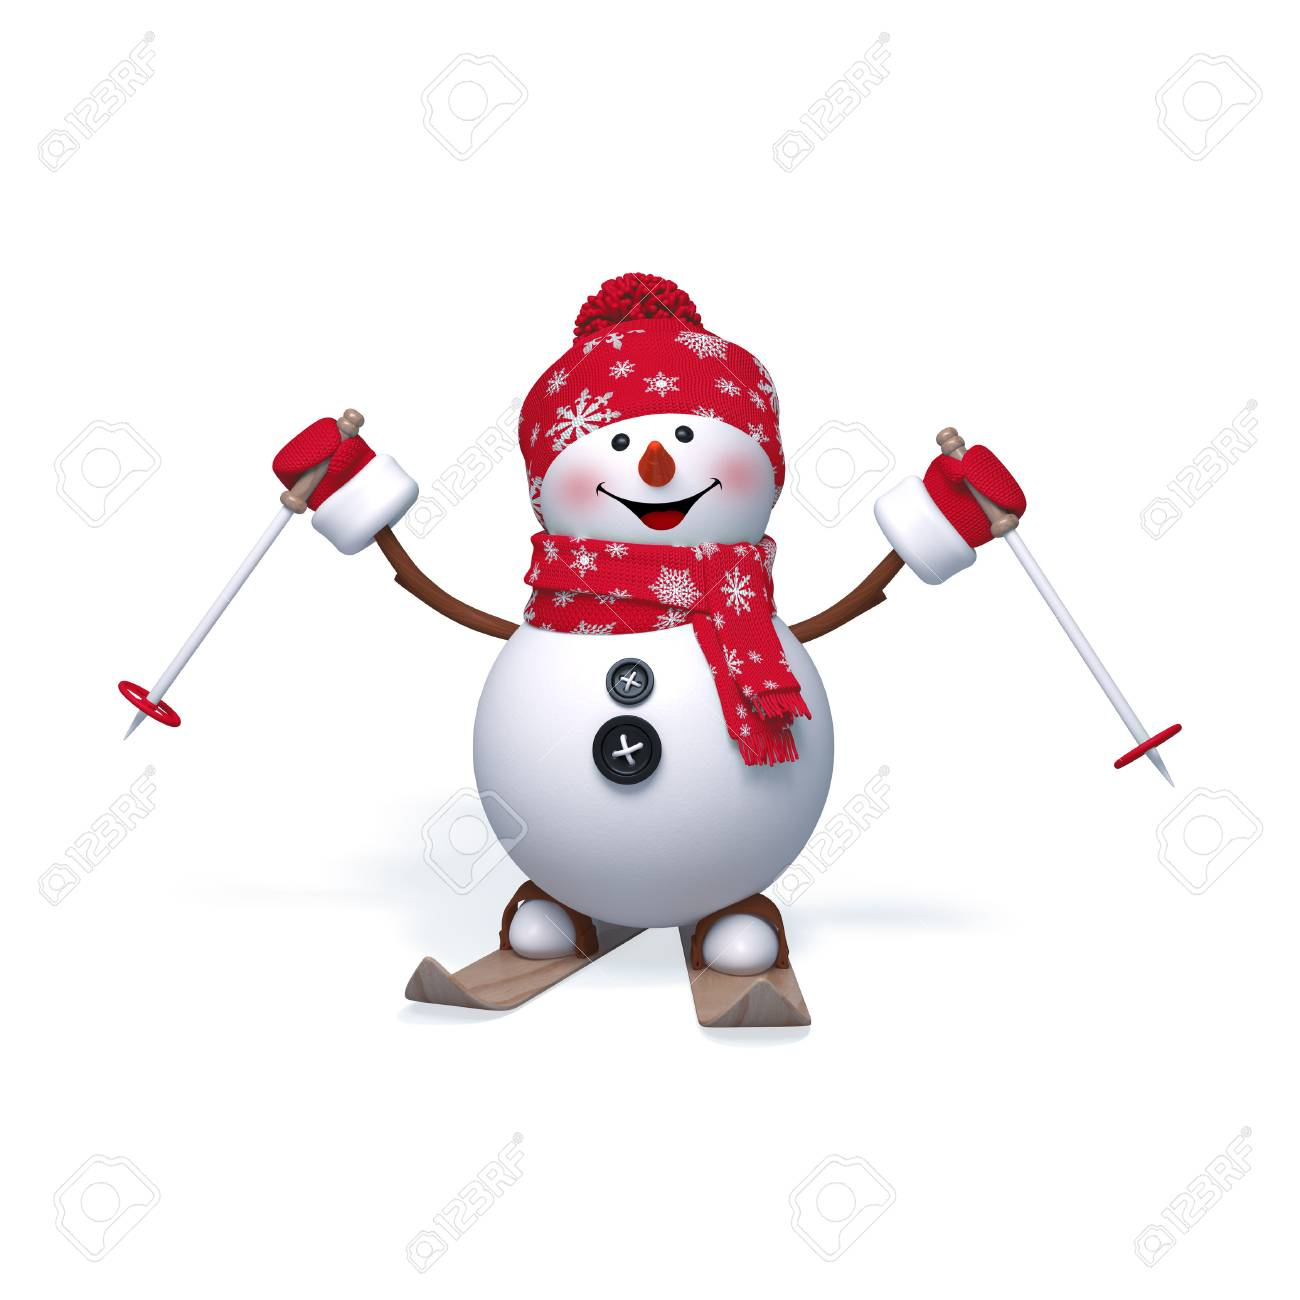 Game Snowman skiing